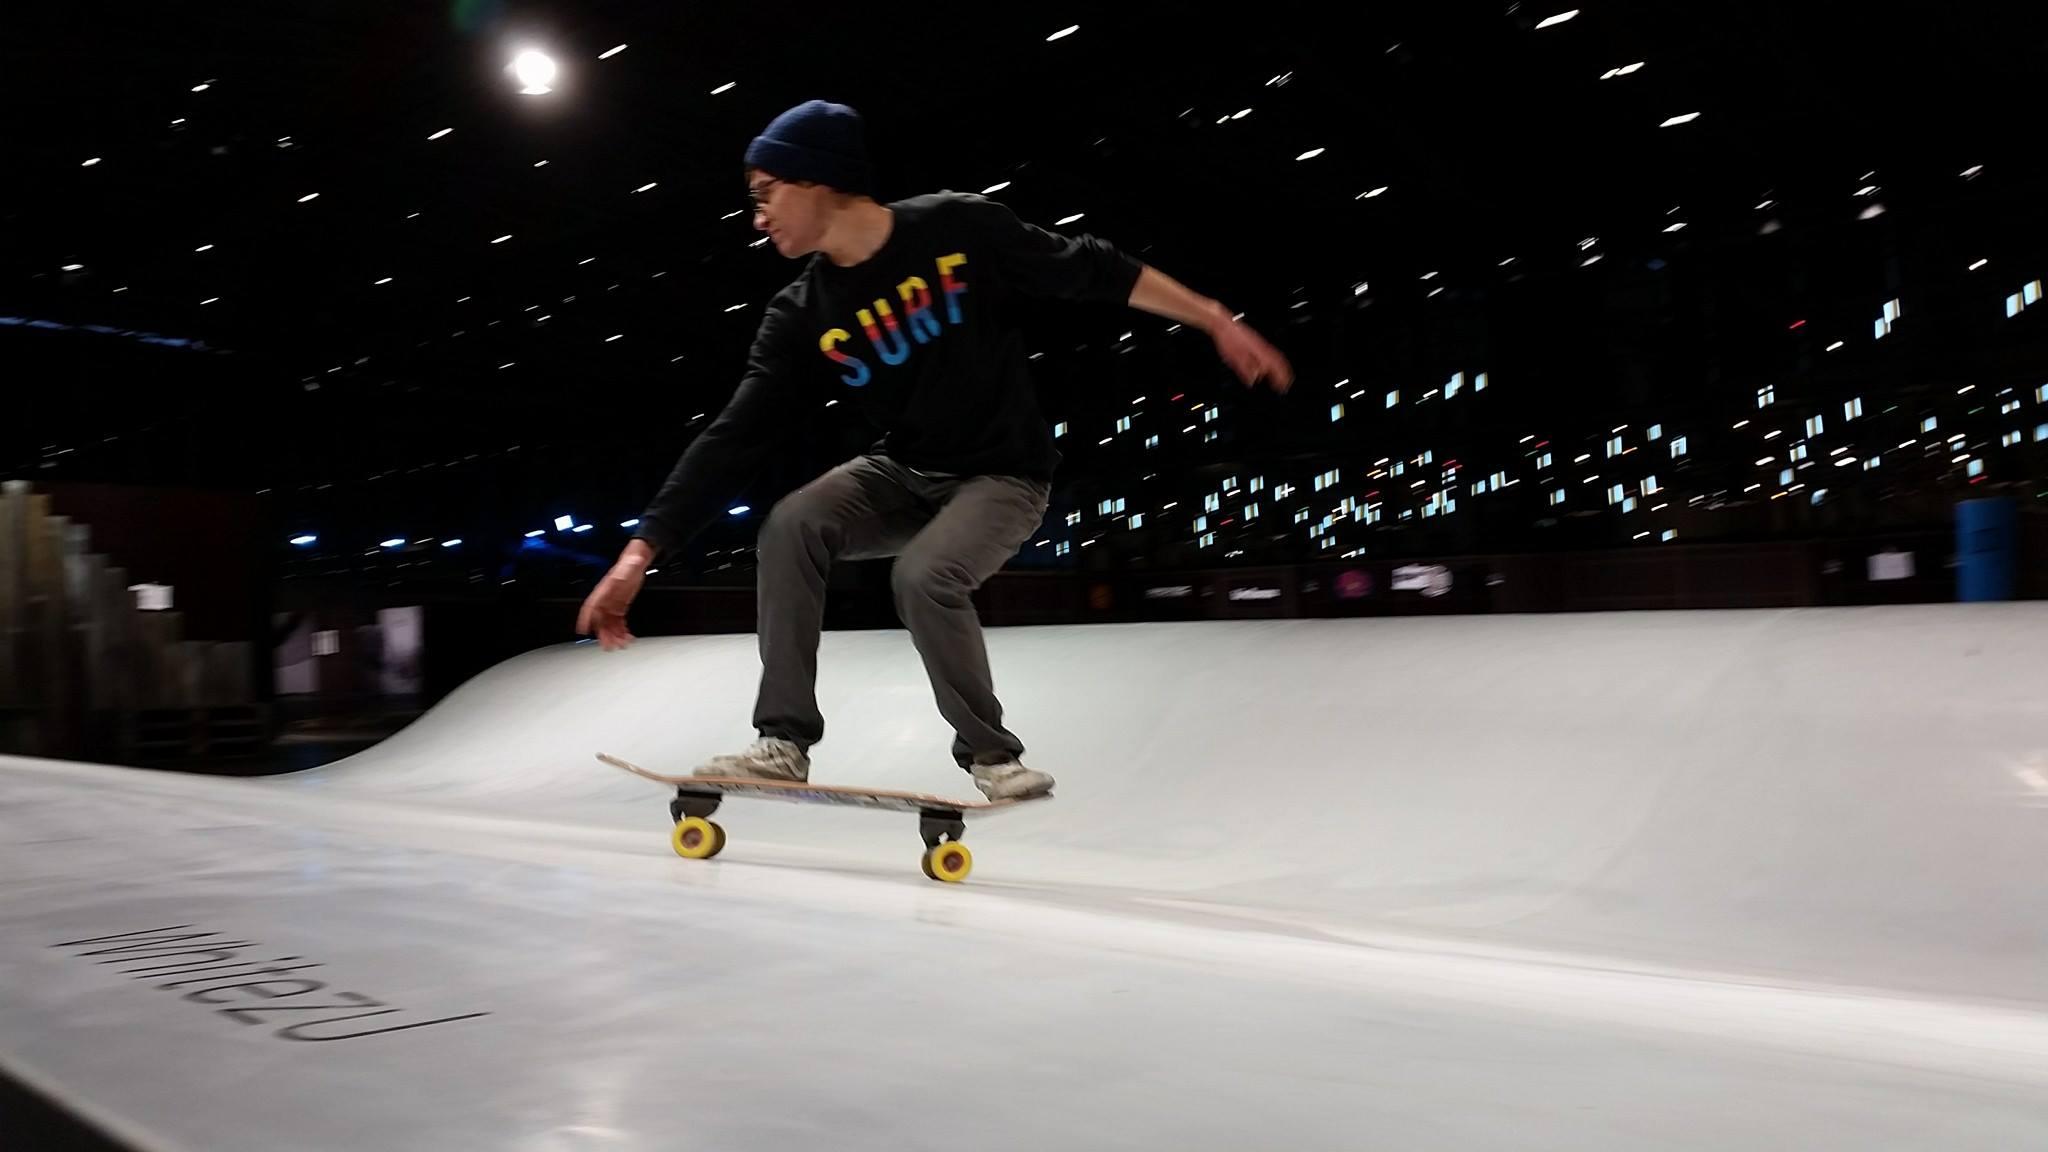 Whitezu Surfskate Urban Wave at ISPO Munich